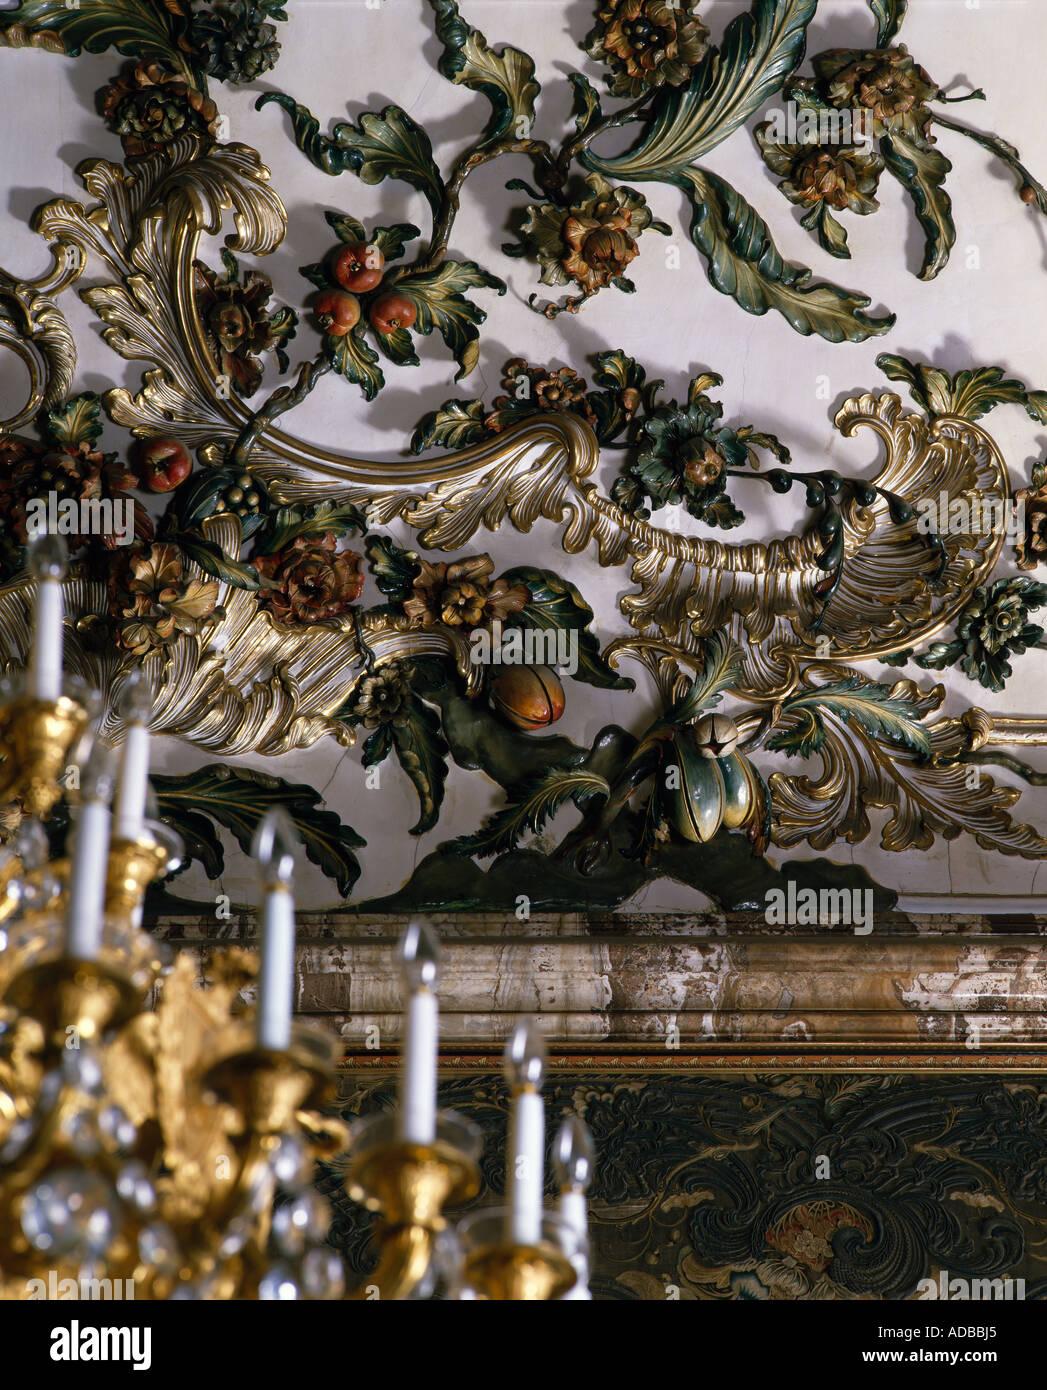 Royal Palace Madrid. Moulded plaster work of fruit. Stock Photo